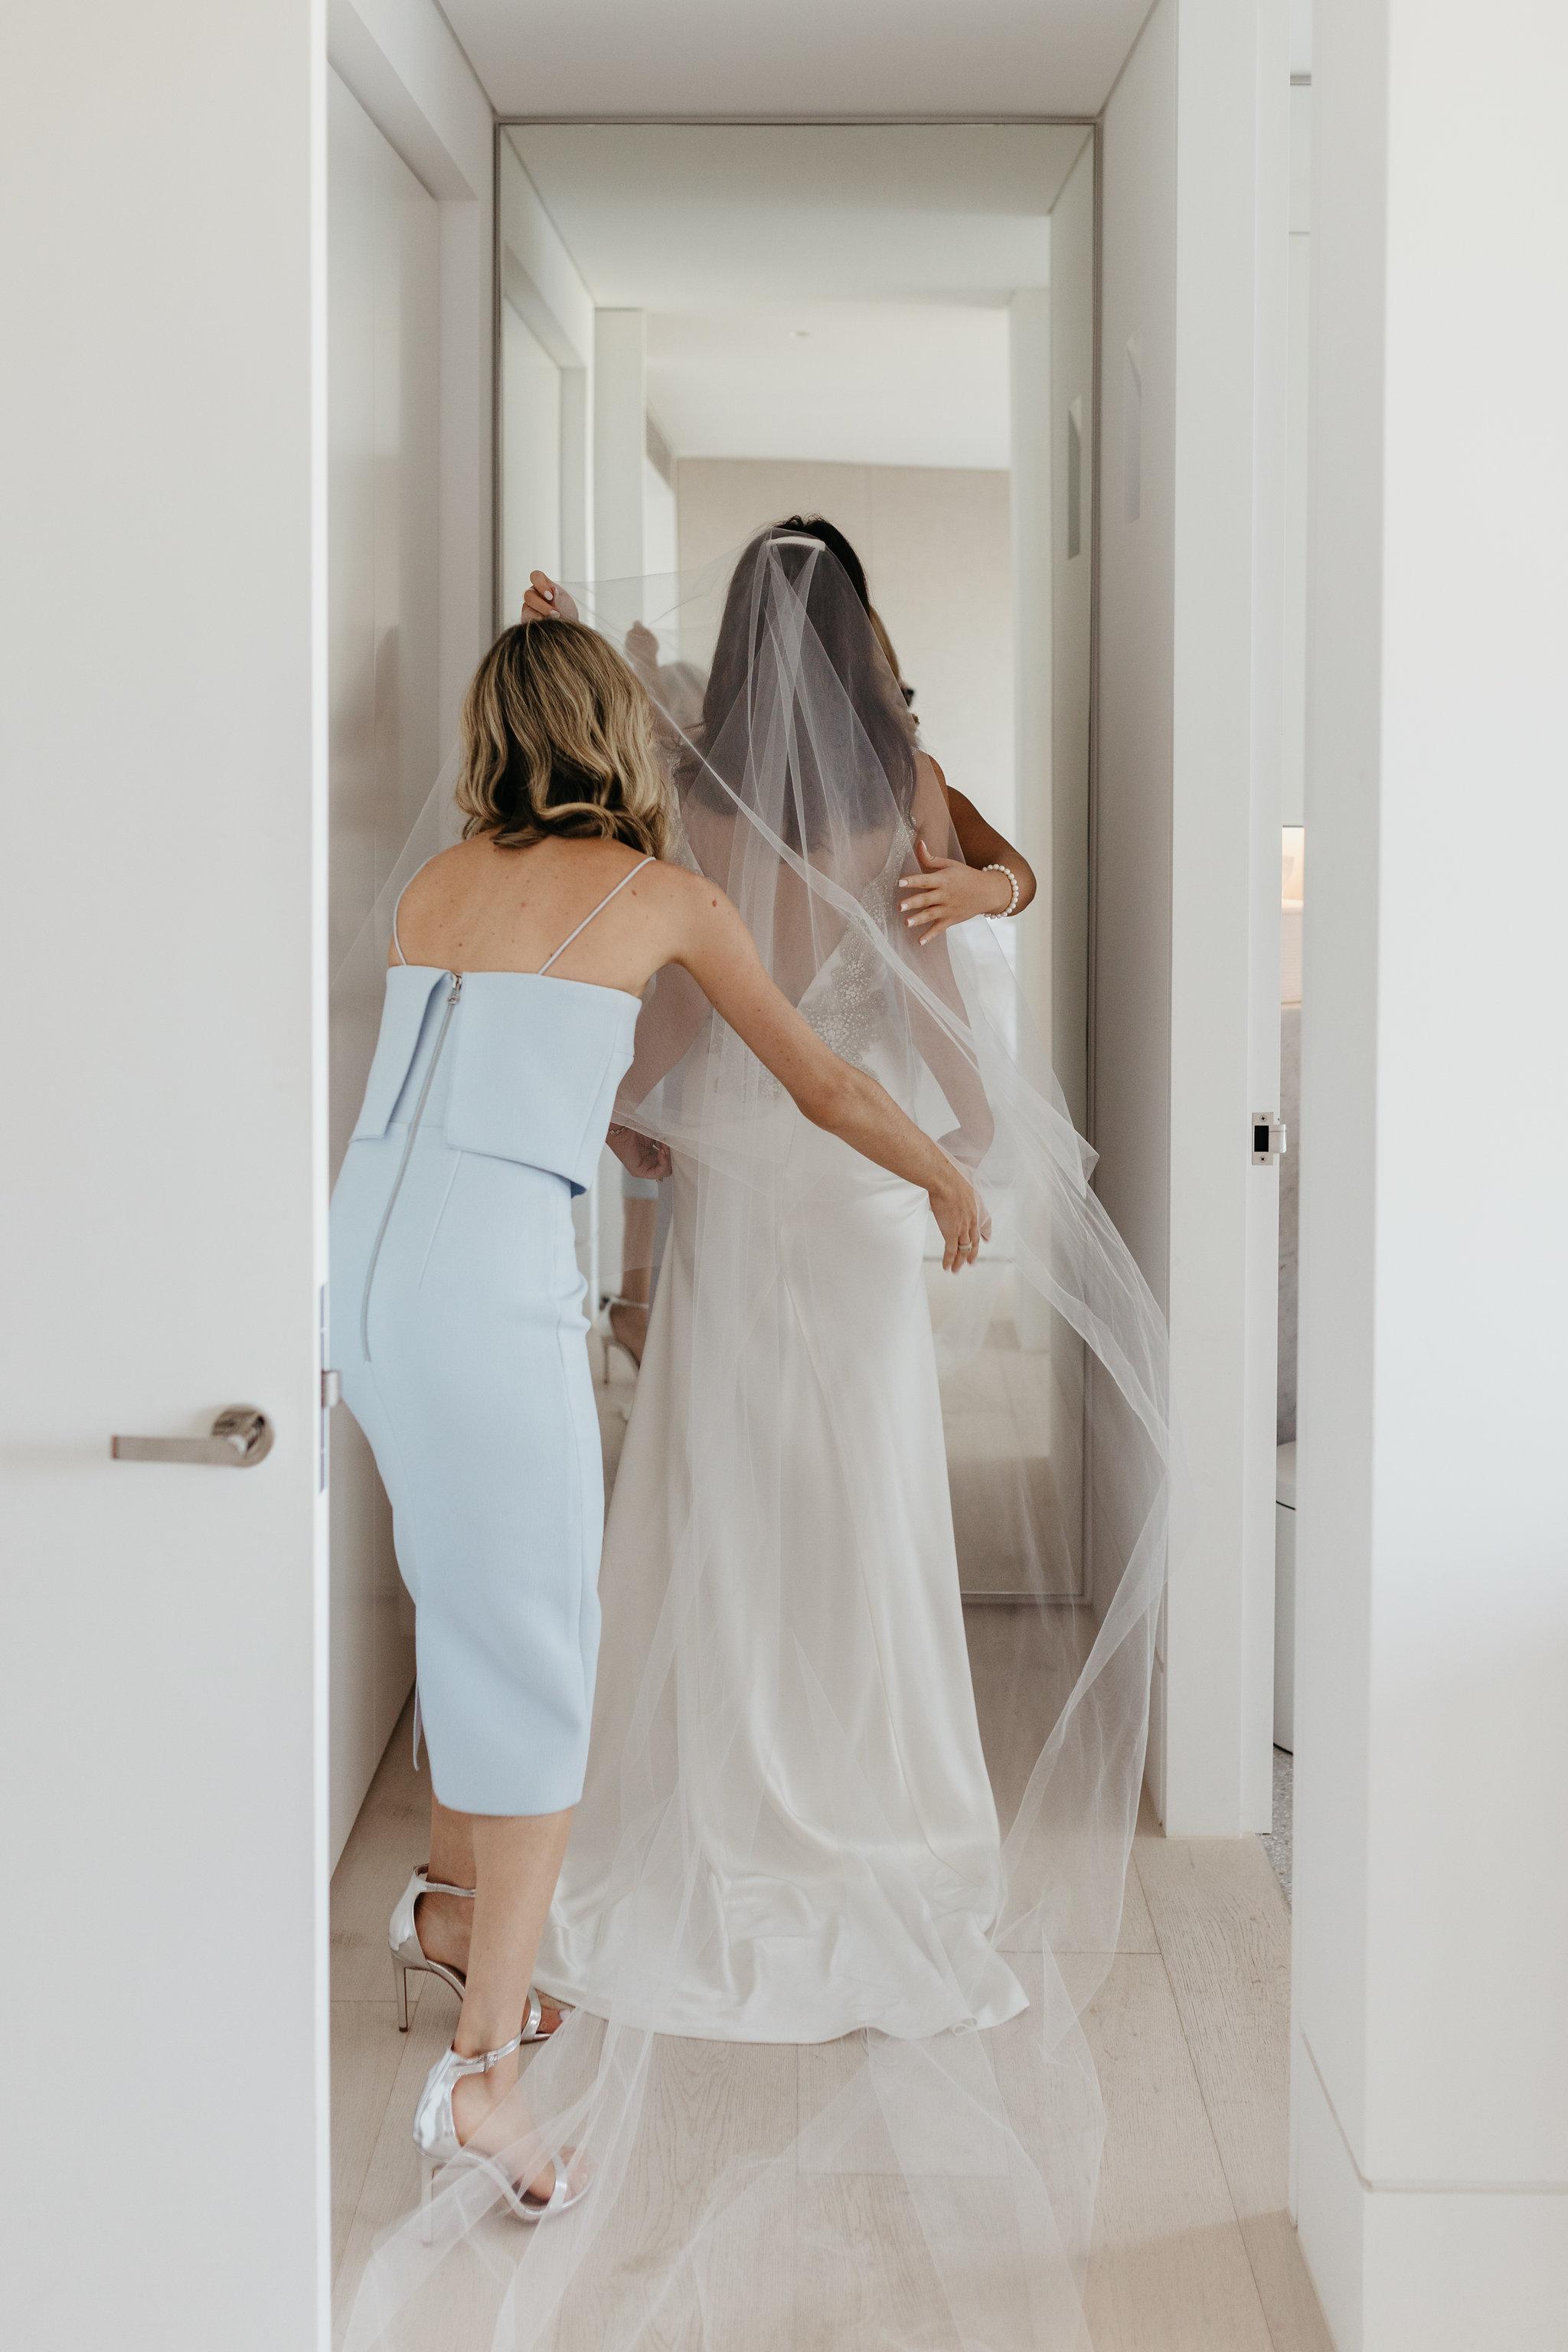 gen_chris_story_of_us_wedding-0196.JPG